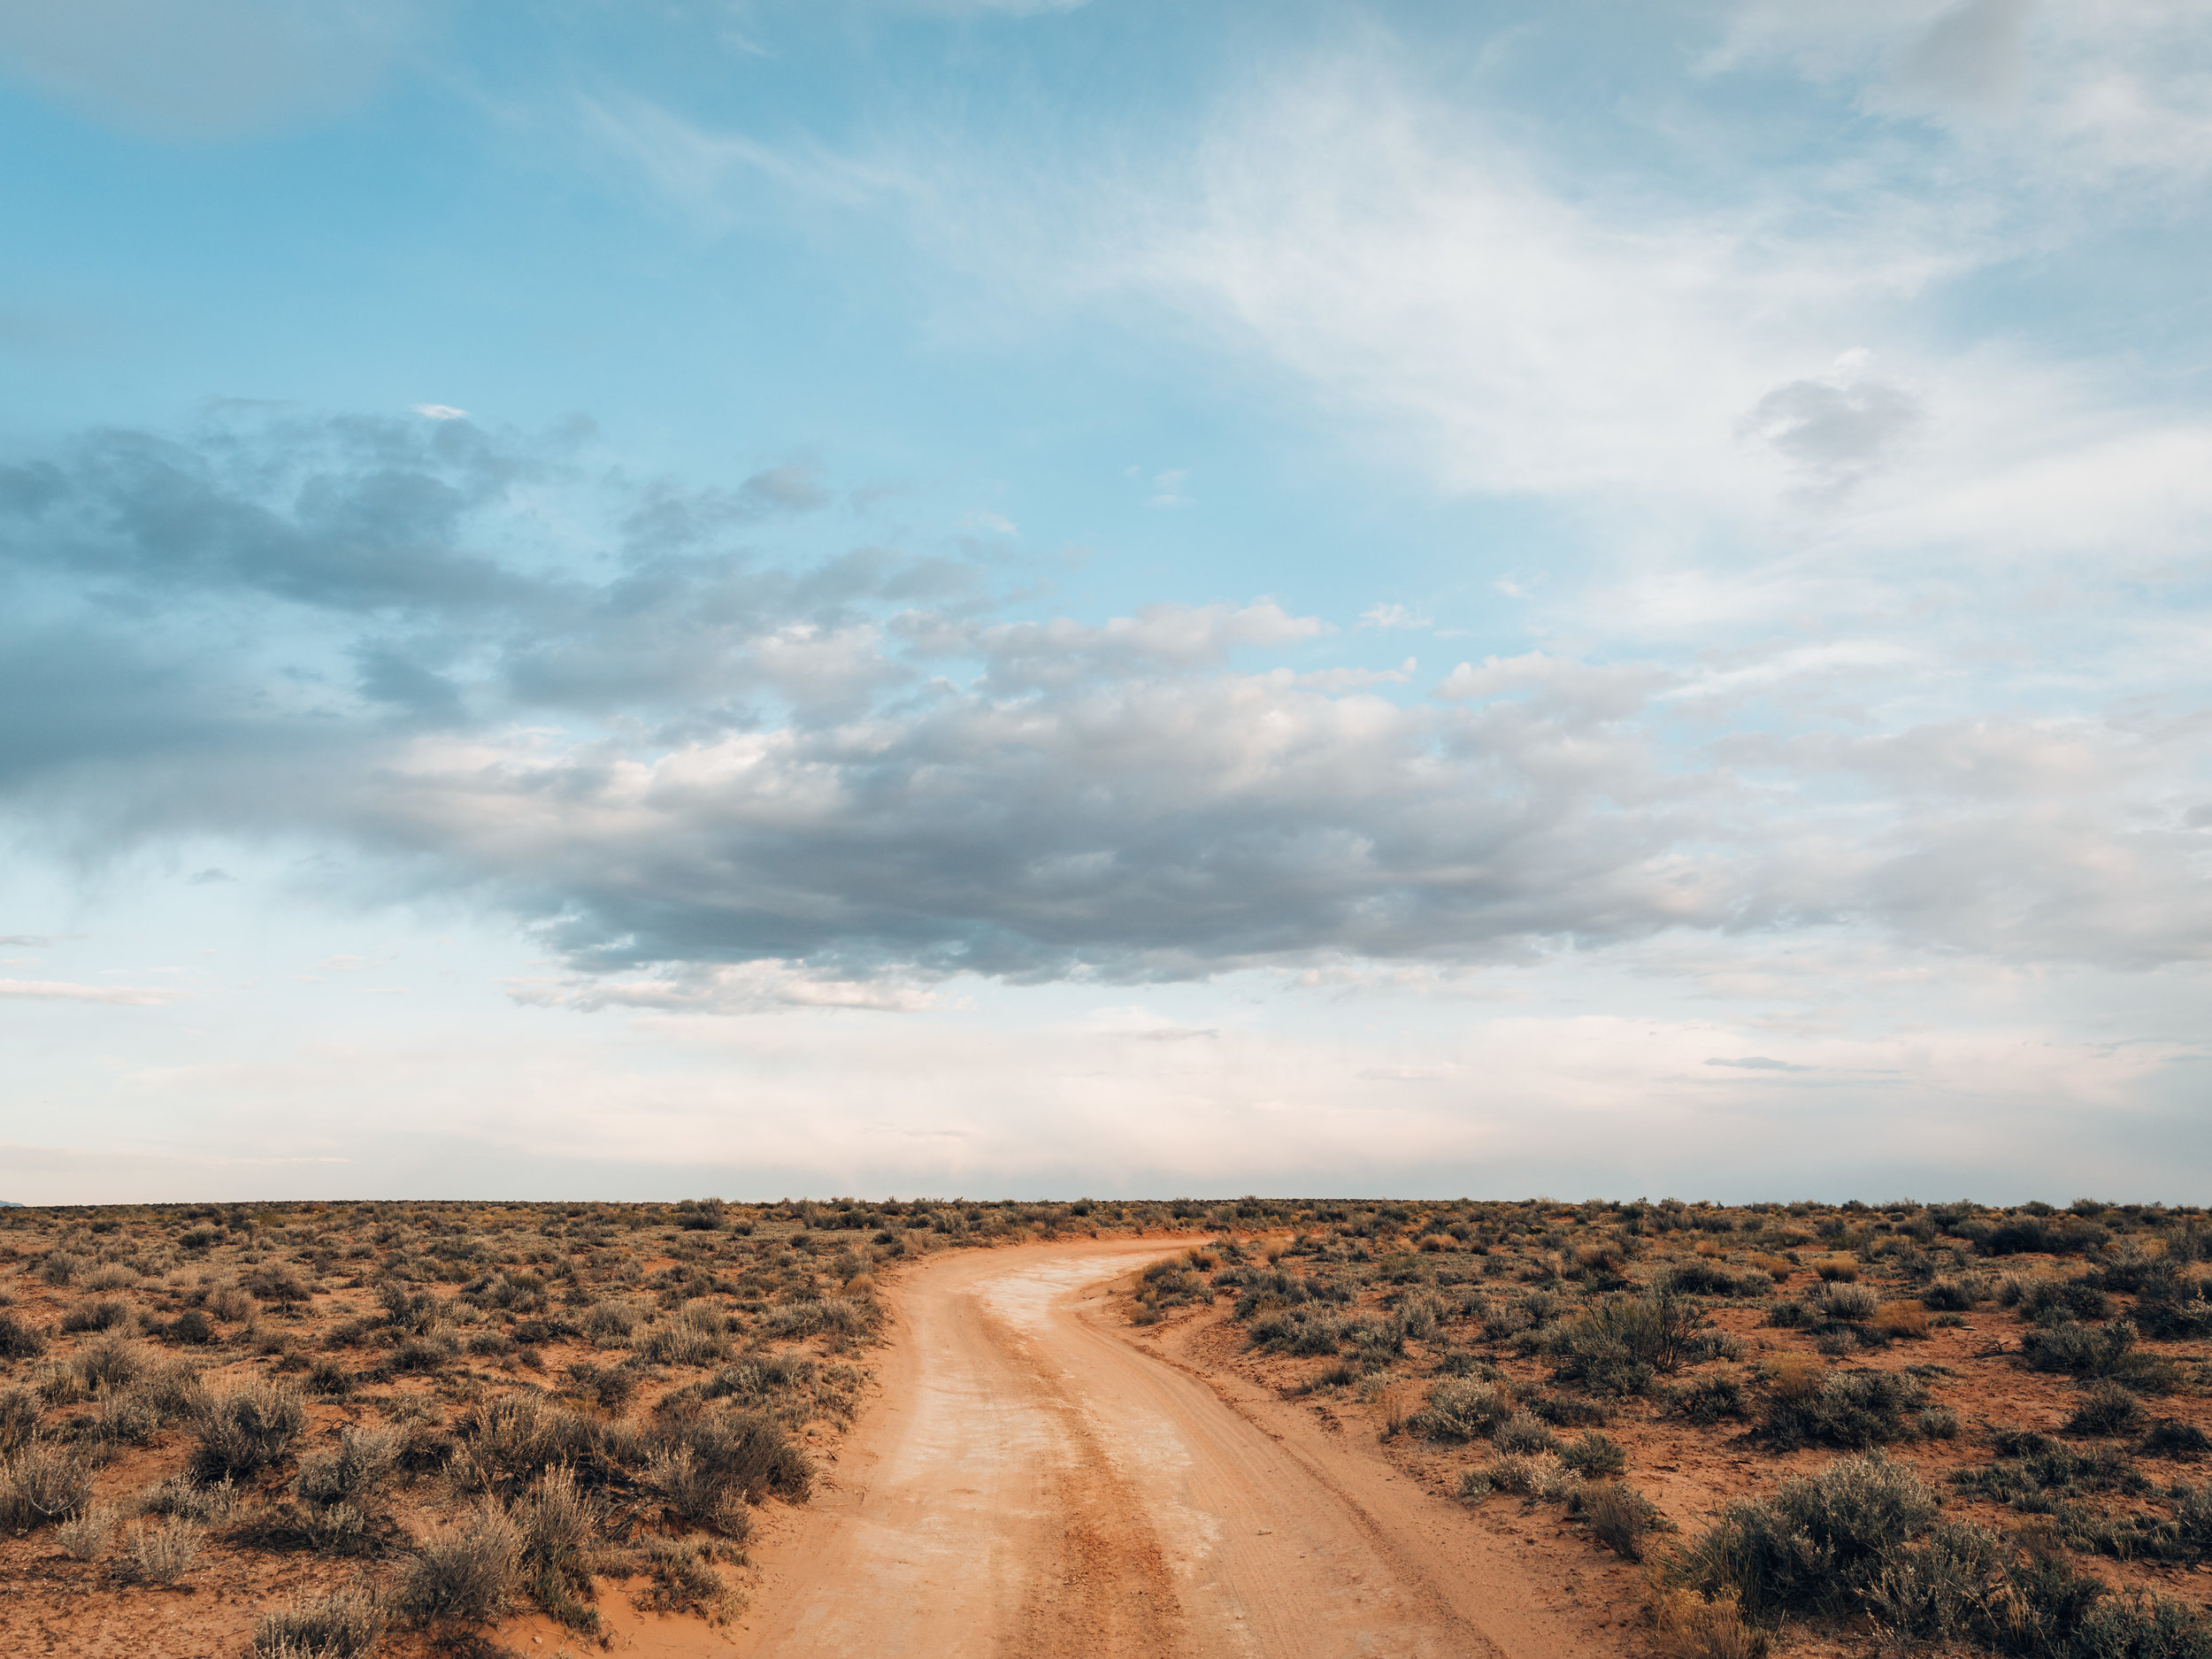 Utah_BadwaterRoad.jpg